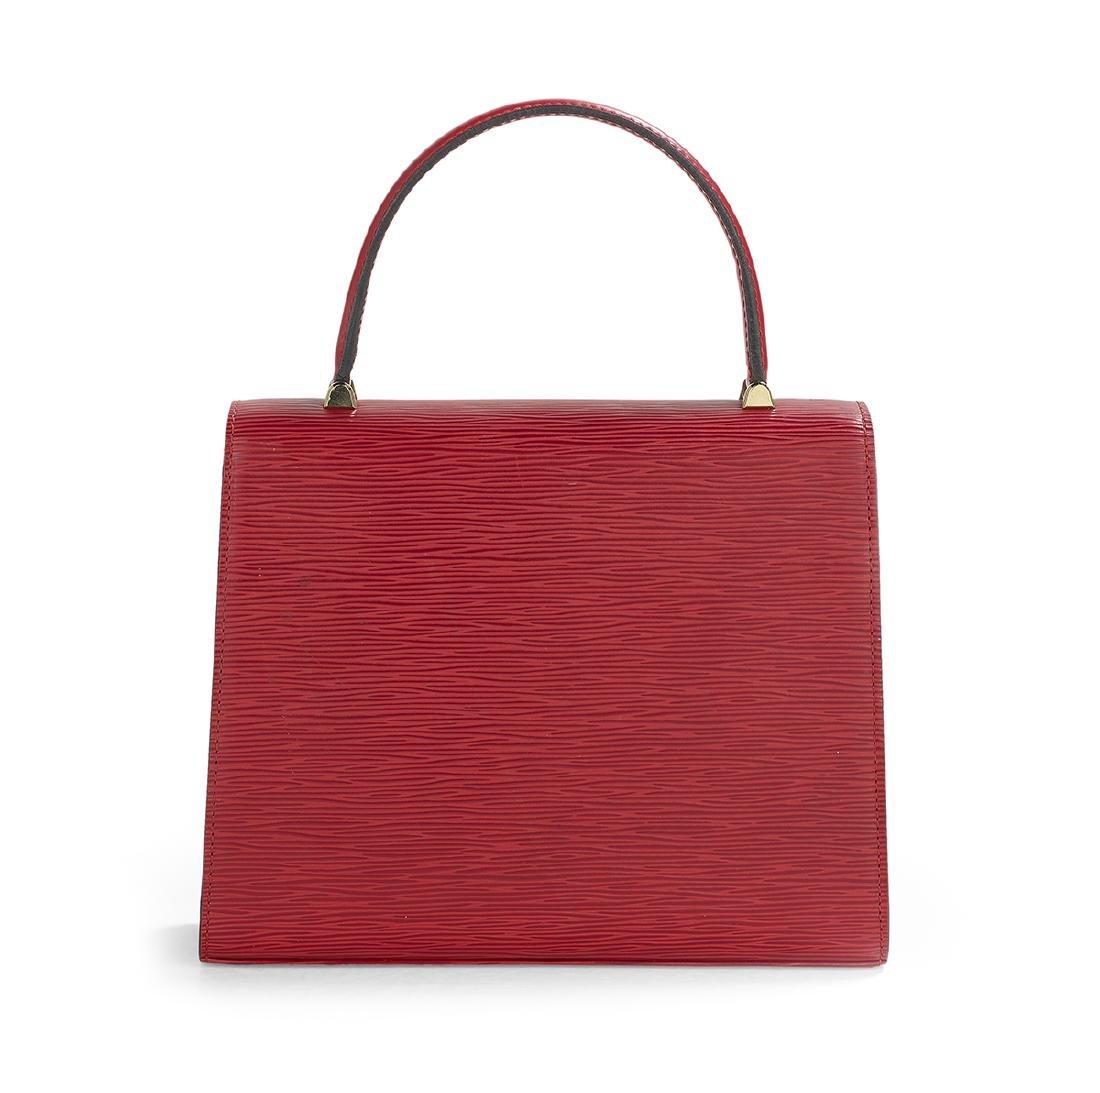 "Louis Vuitton Epi Leather ""Malesherbes"" Handbag - 2"